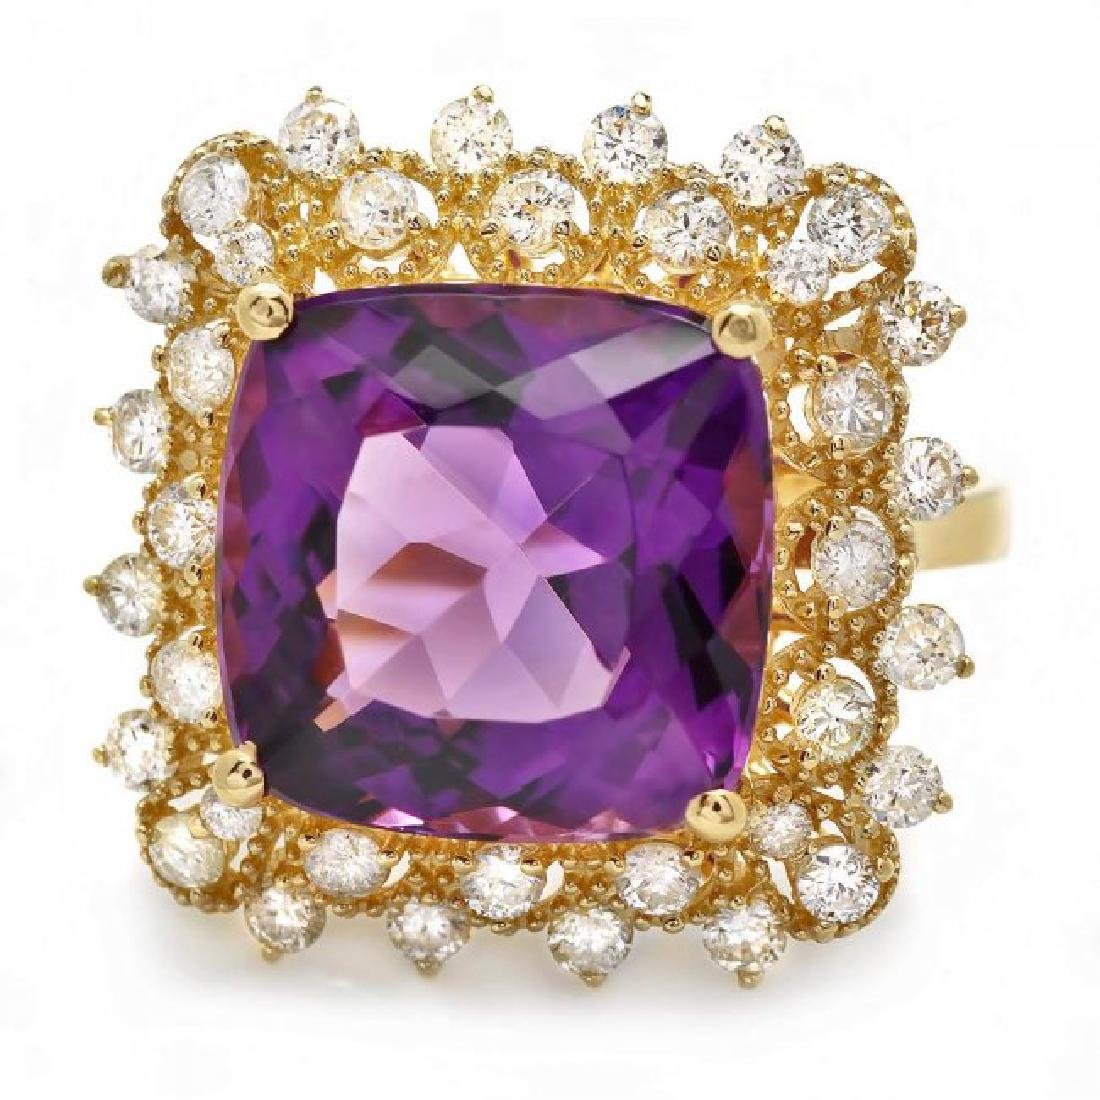 14k Gold 7.30ct Amethyst 1.00ct Diamond Ring - 2